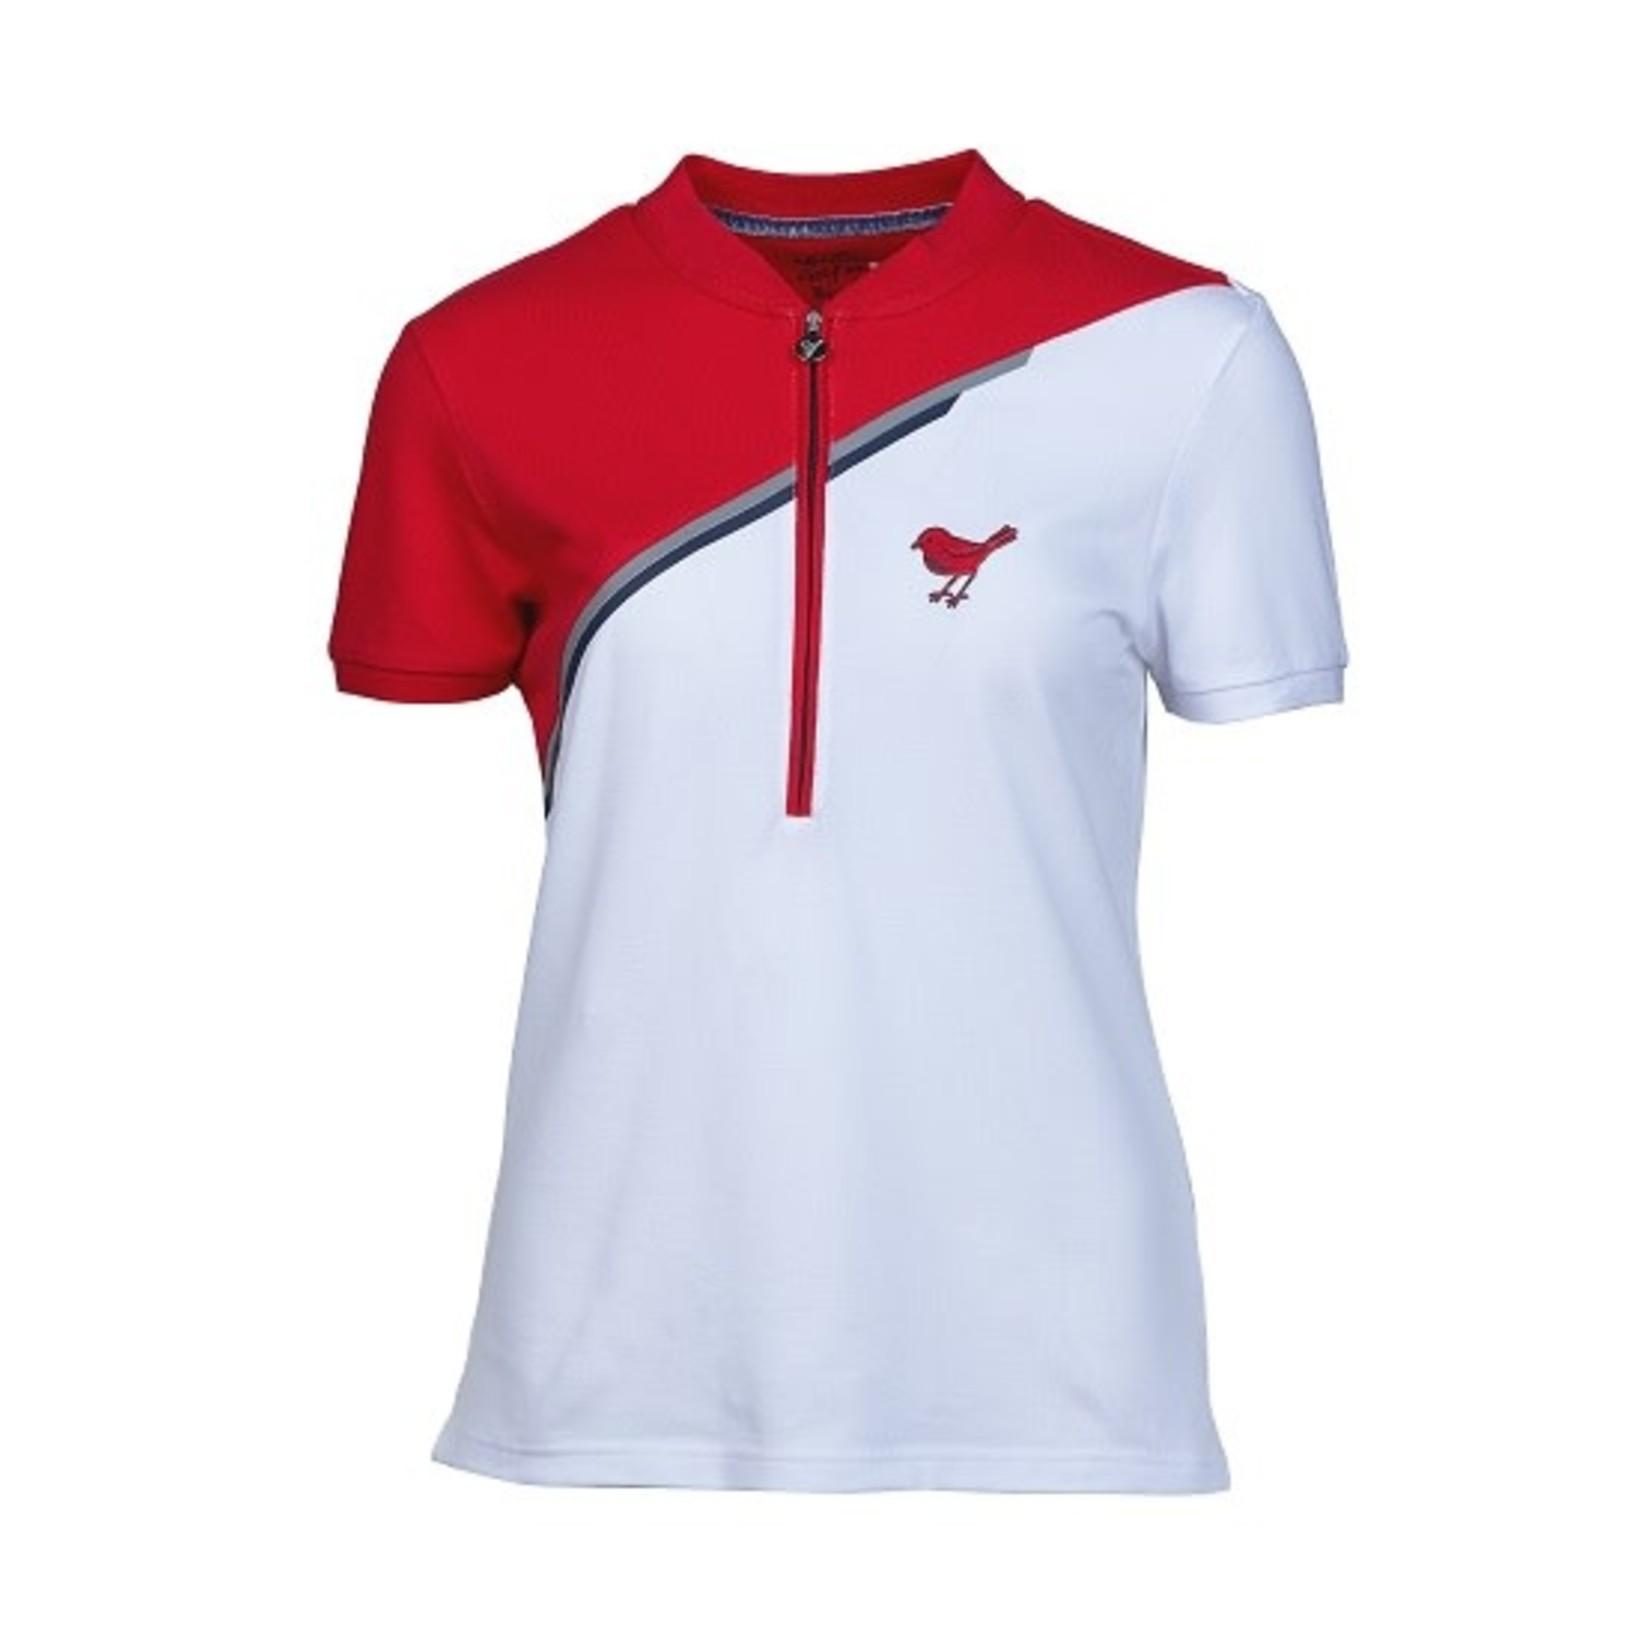 Girls Golf Girls Golf Polo - White/Red Divided